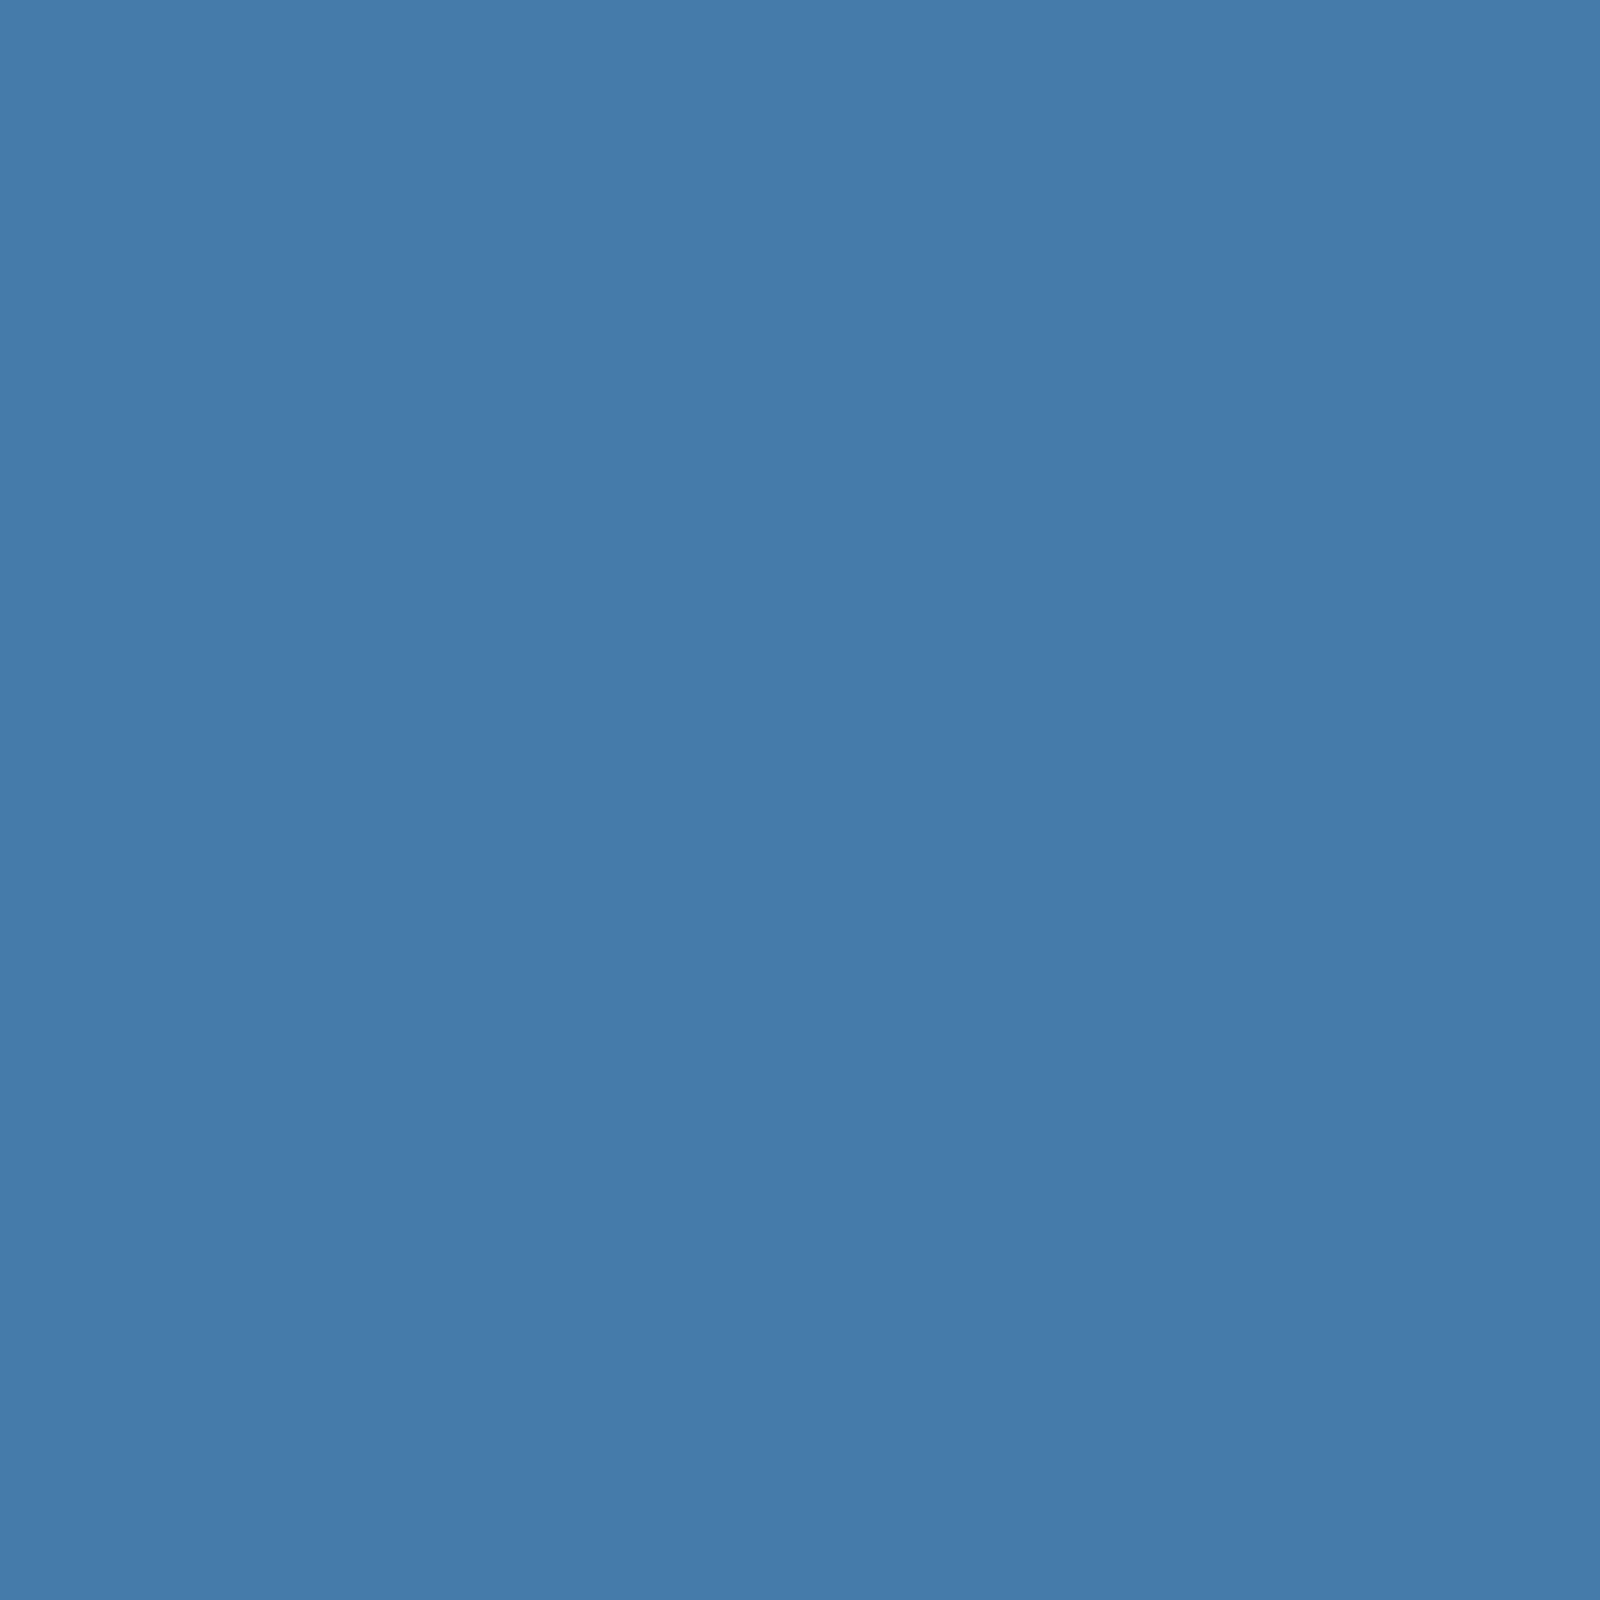 kobra albastru country